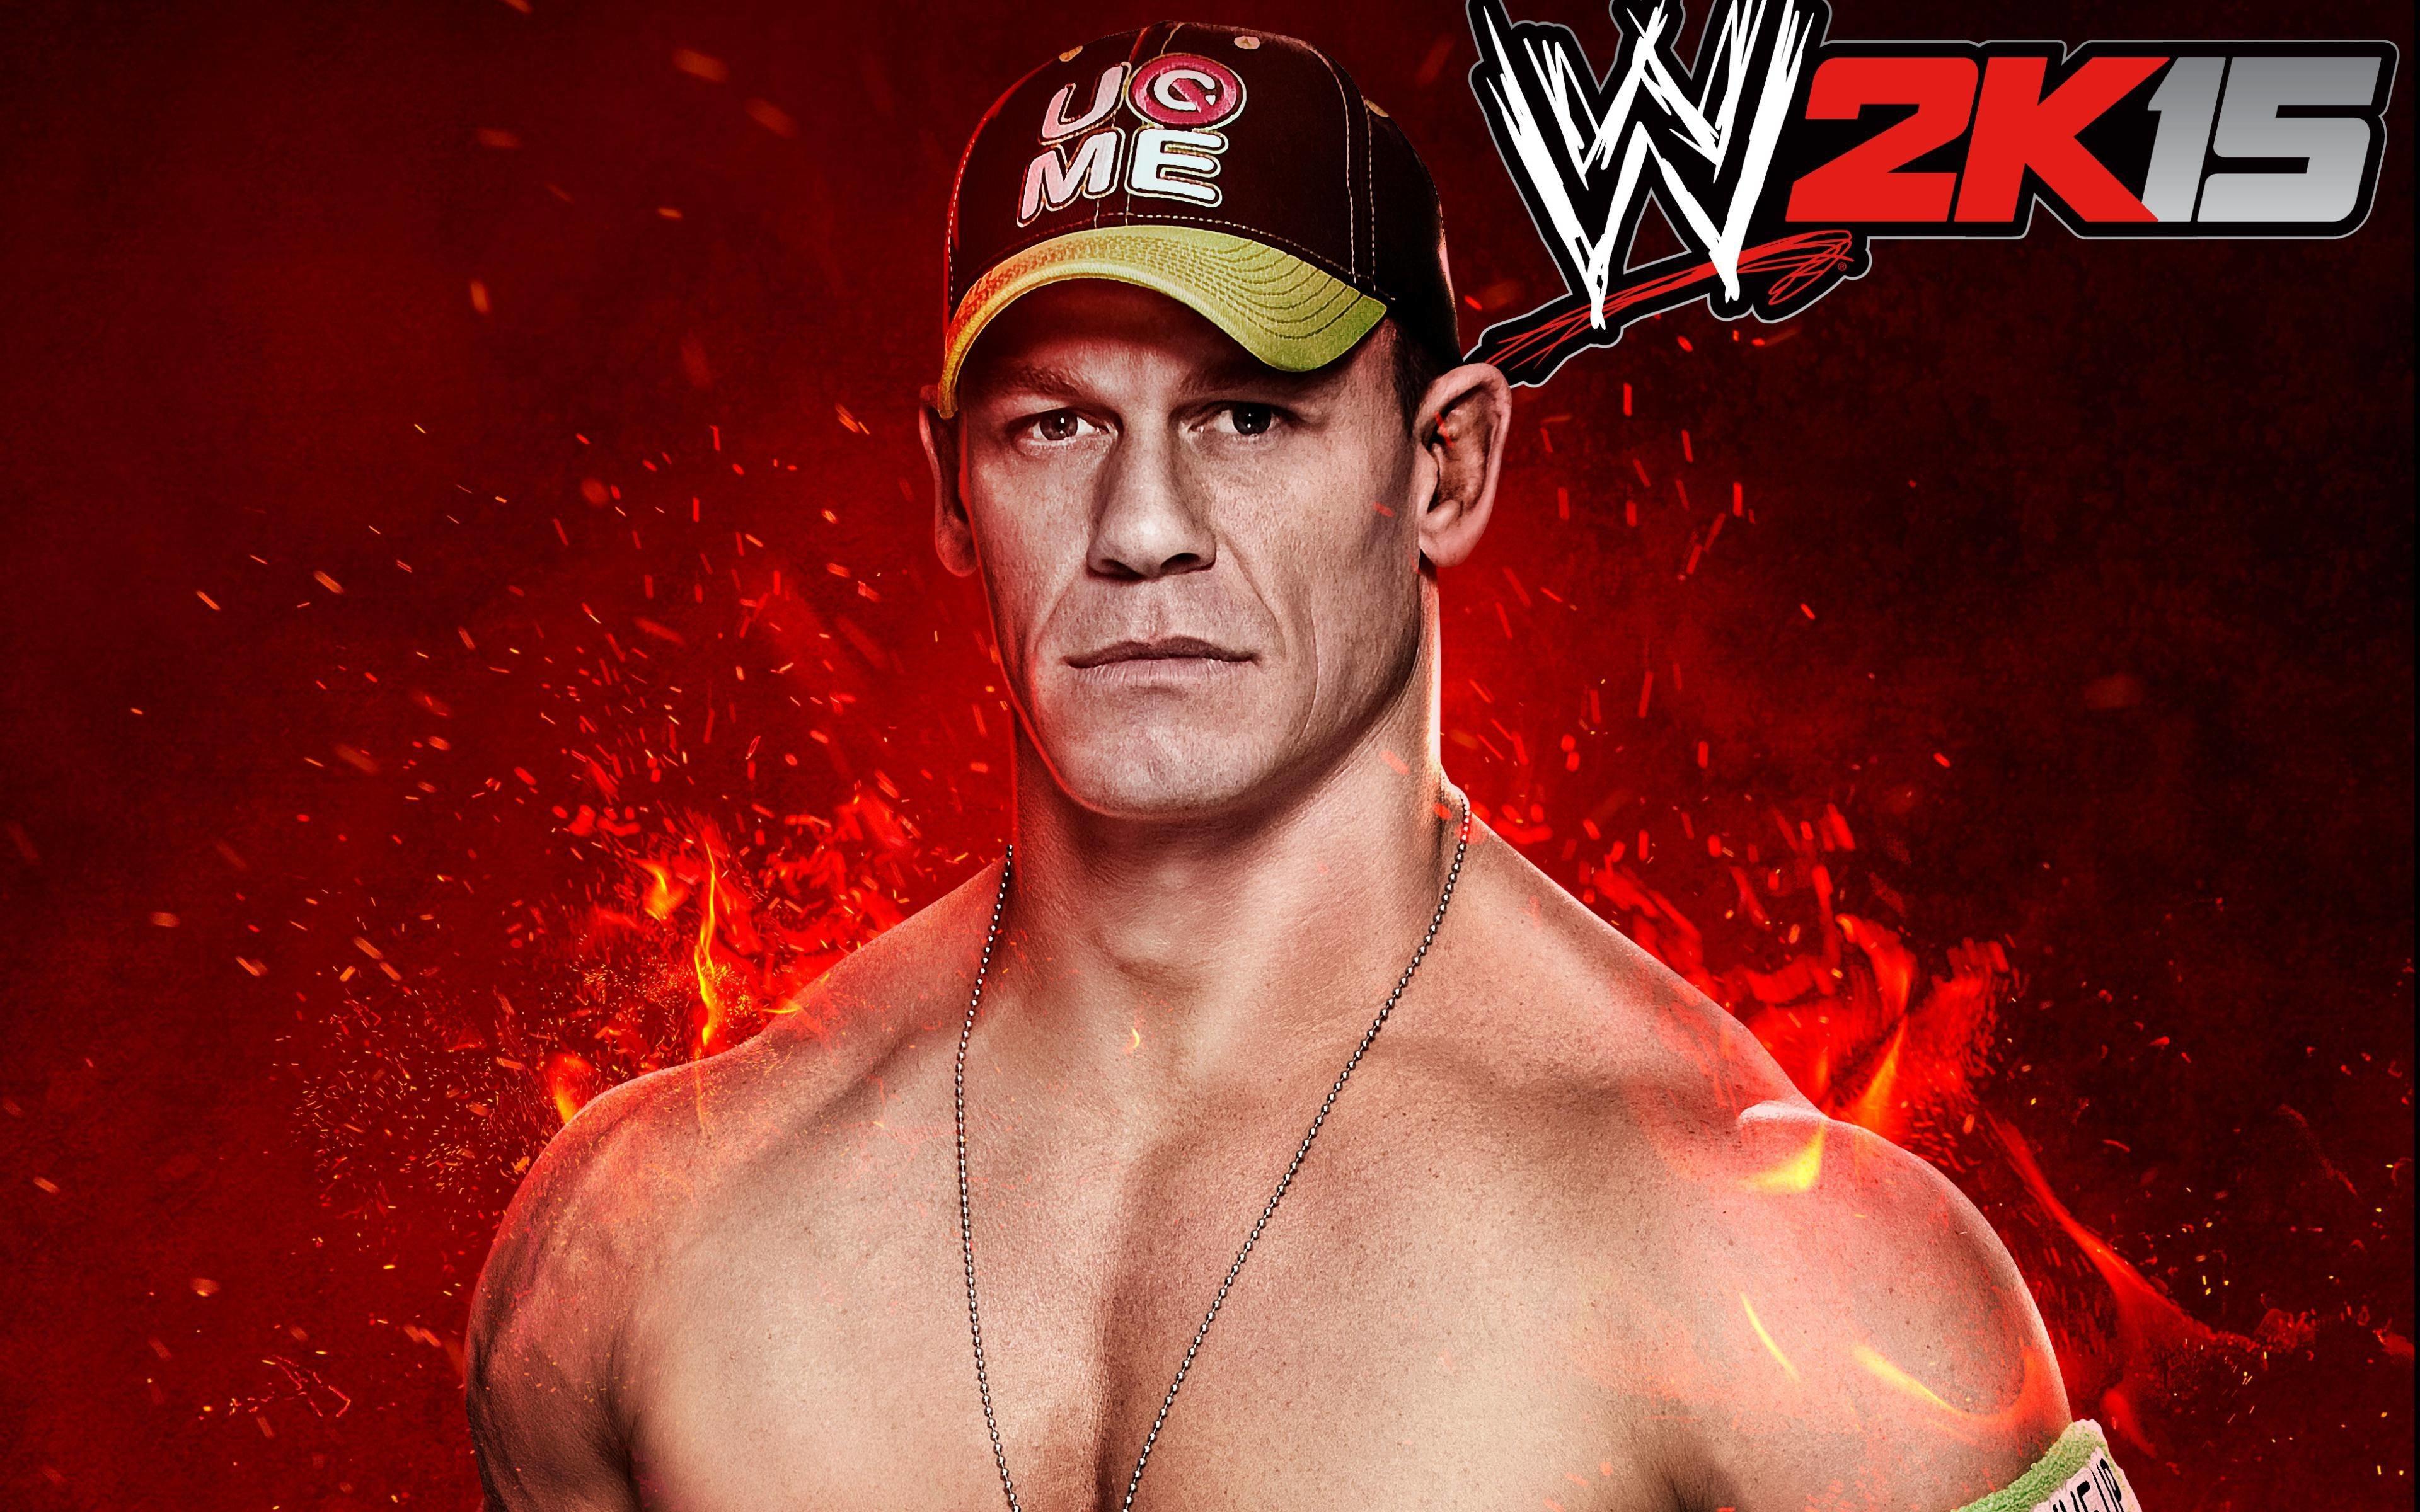 Free John Cena high quality wallpaper